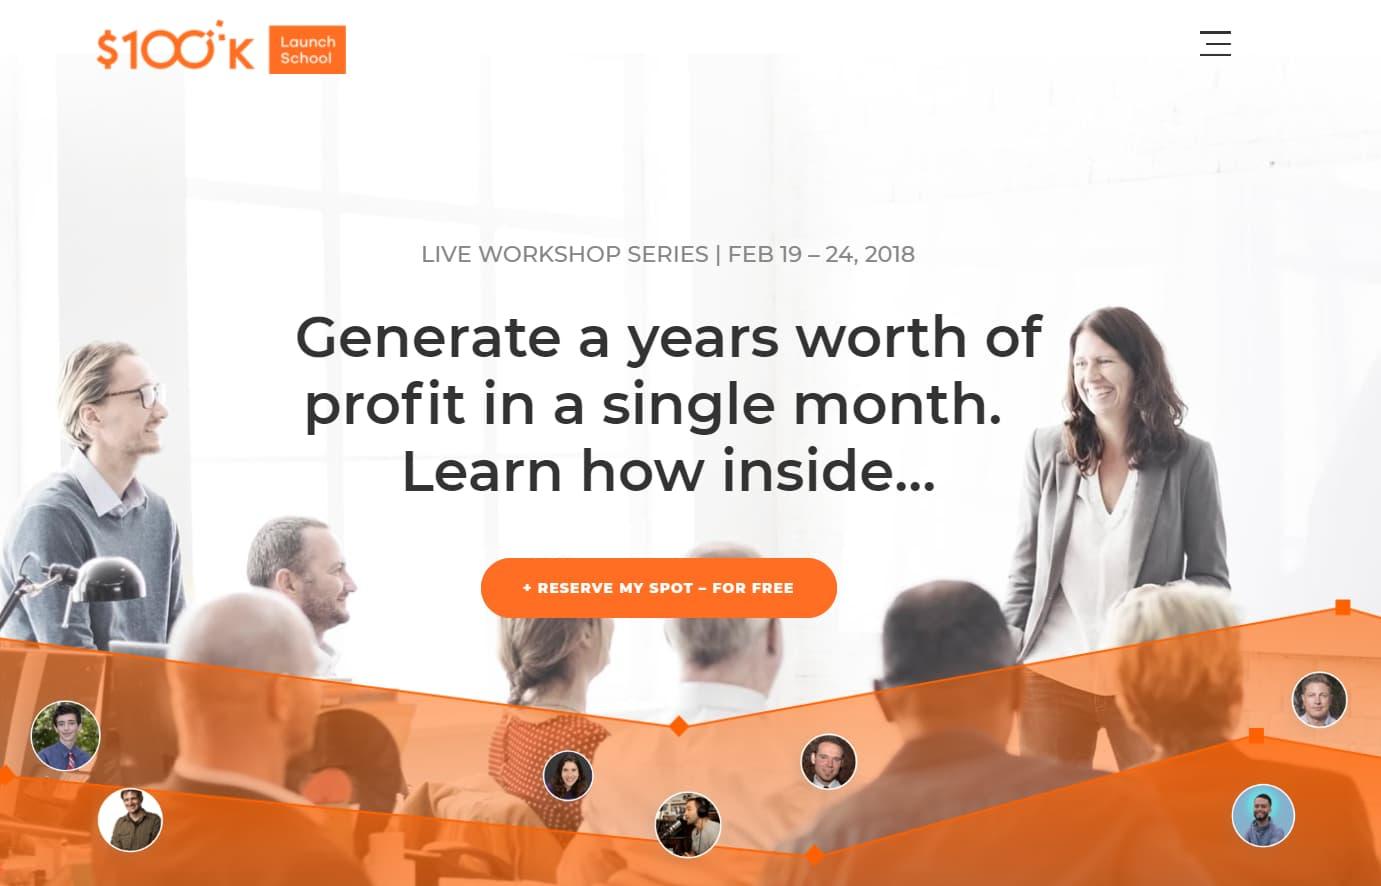 $100k Launch School summit